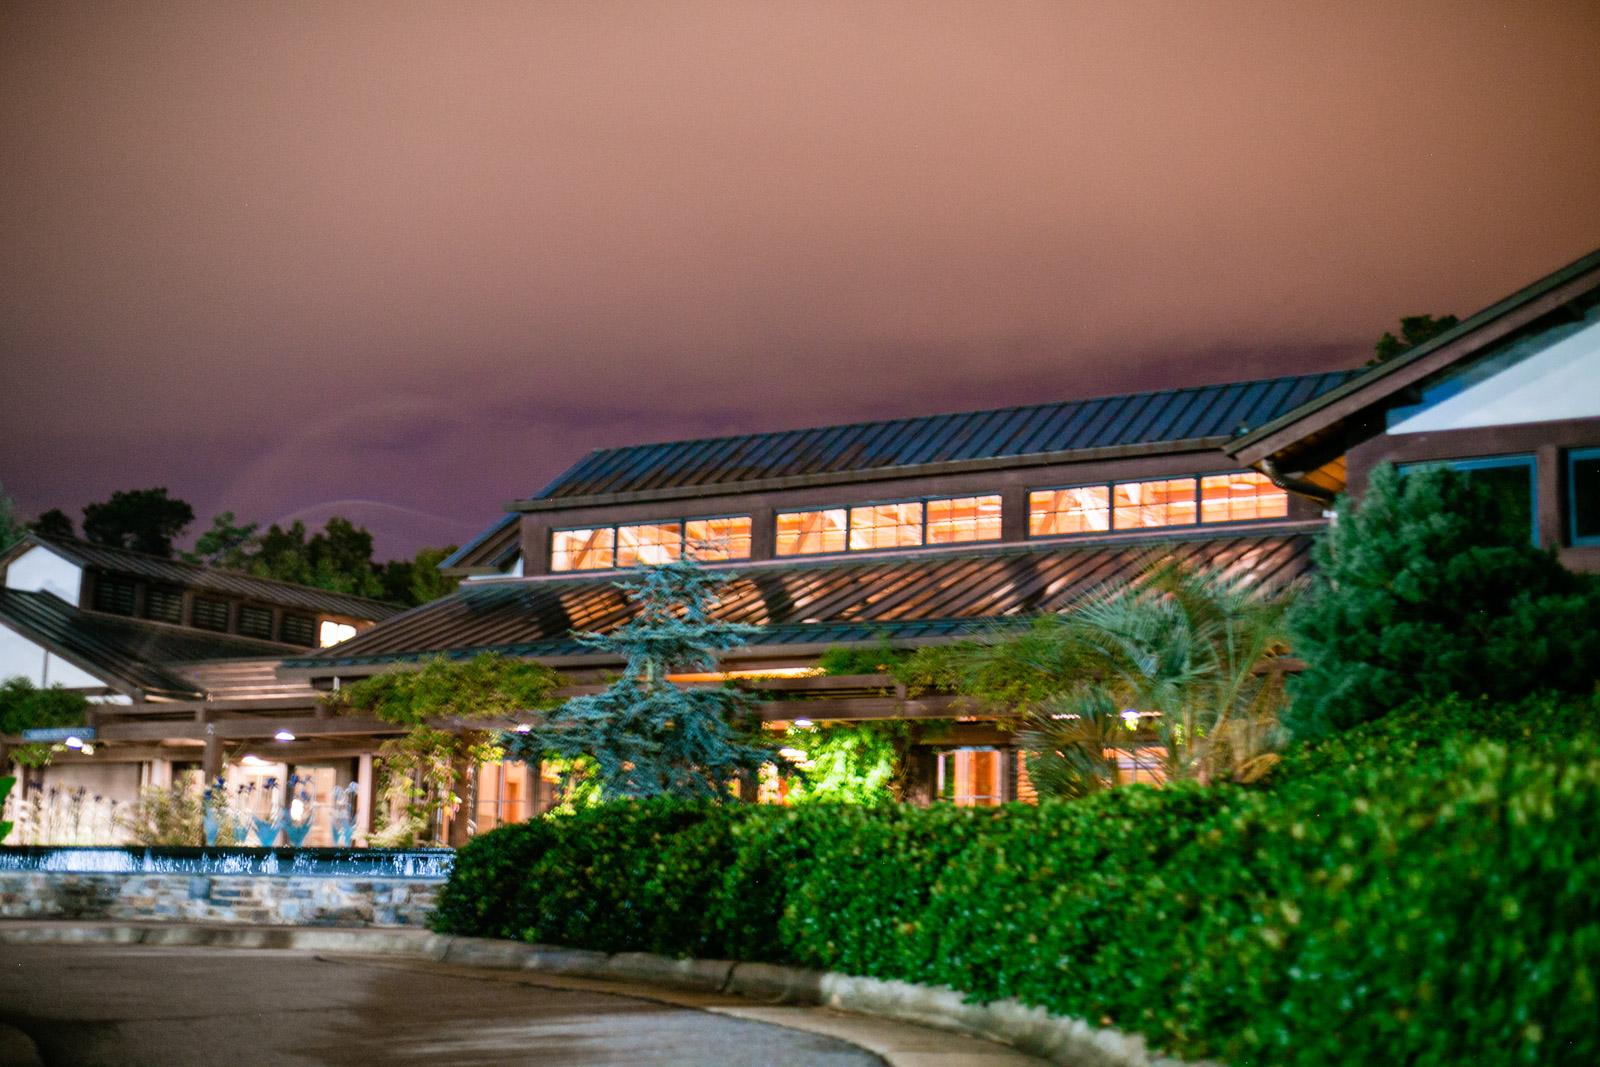 Duke gardens wedding reception venue at night